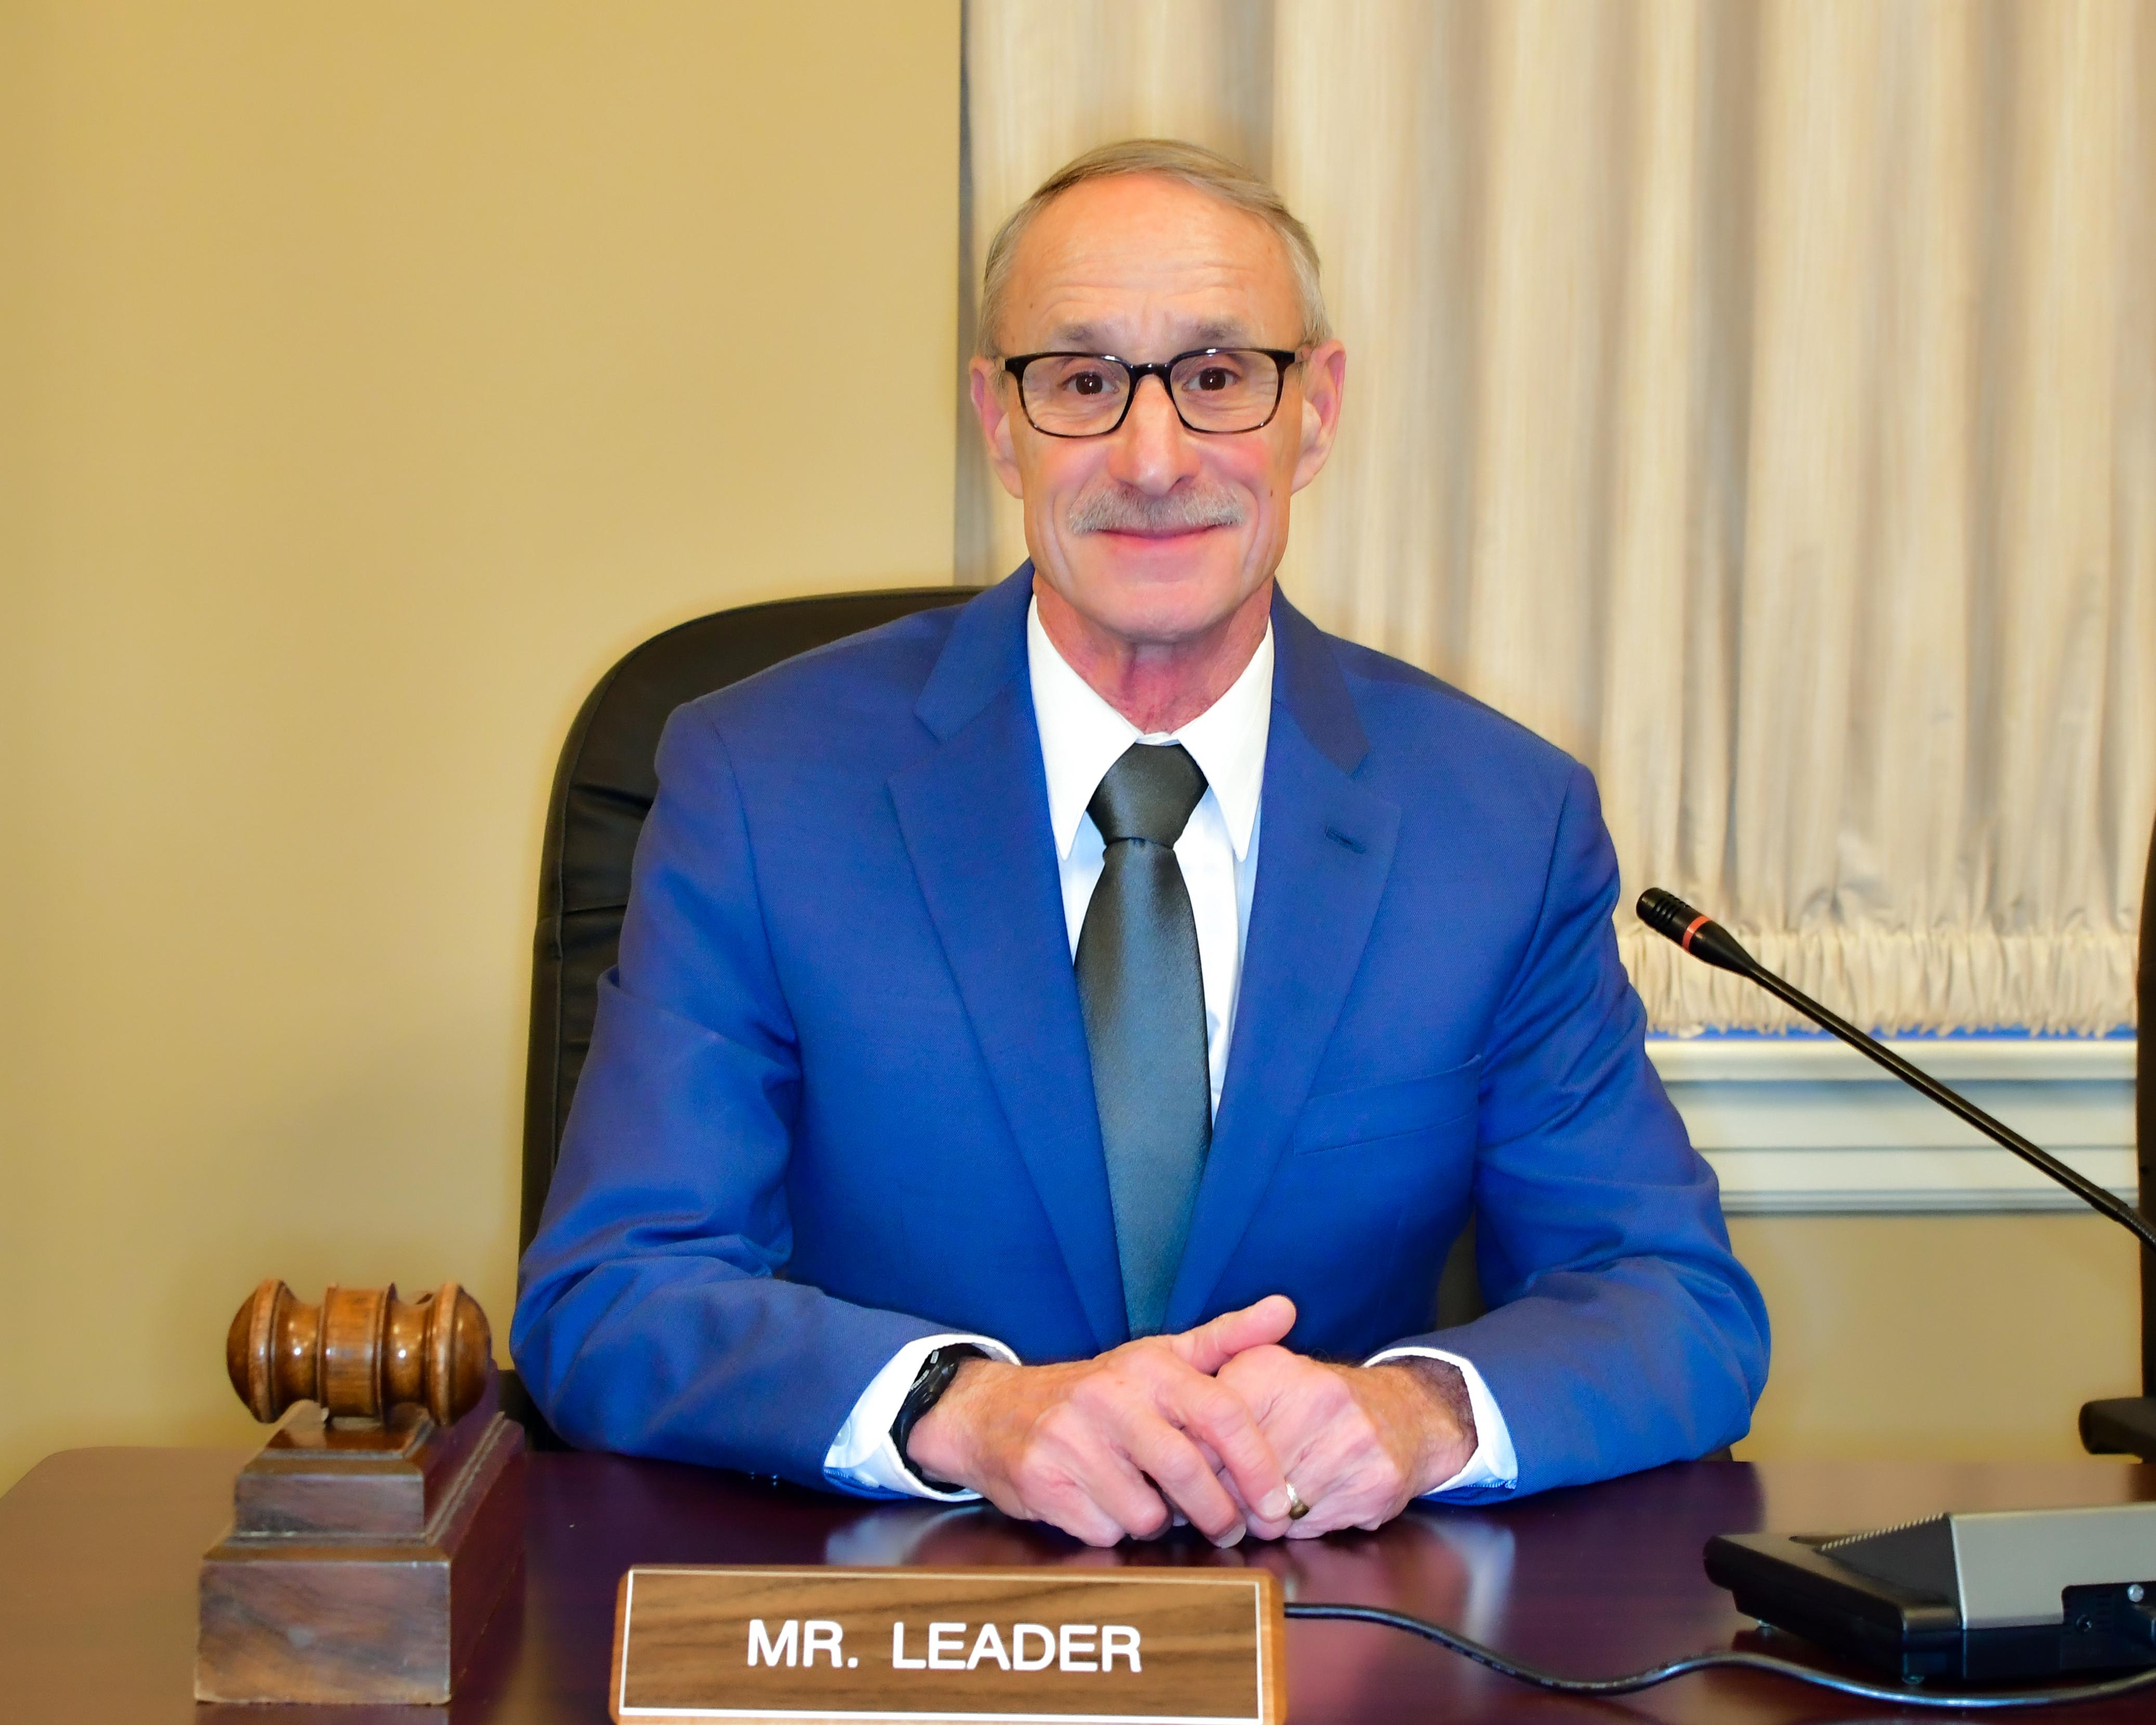 Charles Leader